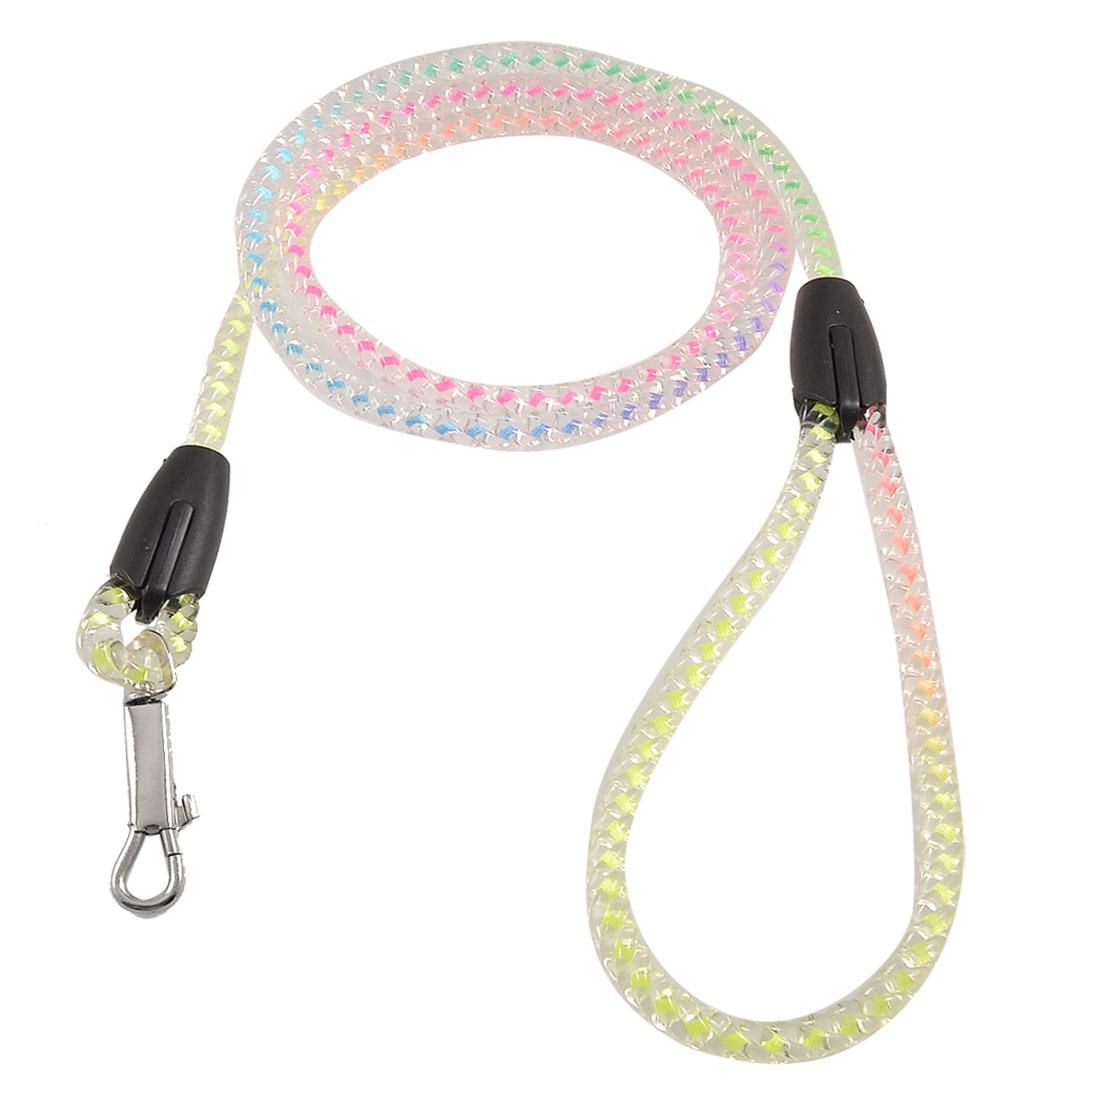 Plastic Crystal Twisted Rope Pet Doggie Dog Lead Leash Multicolor 1.15 Meters